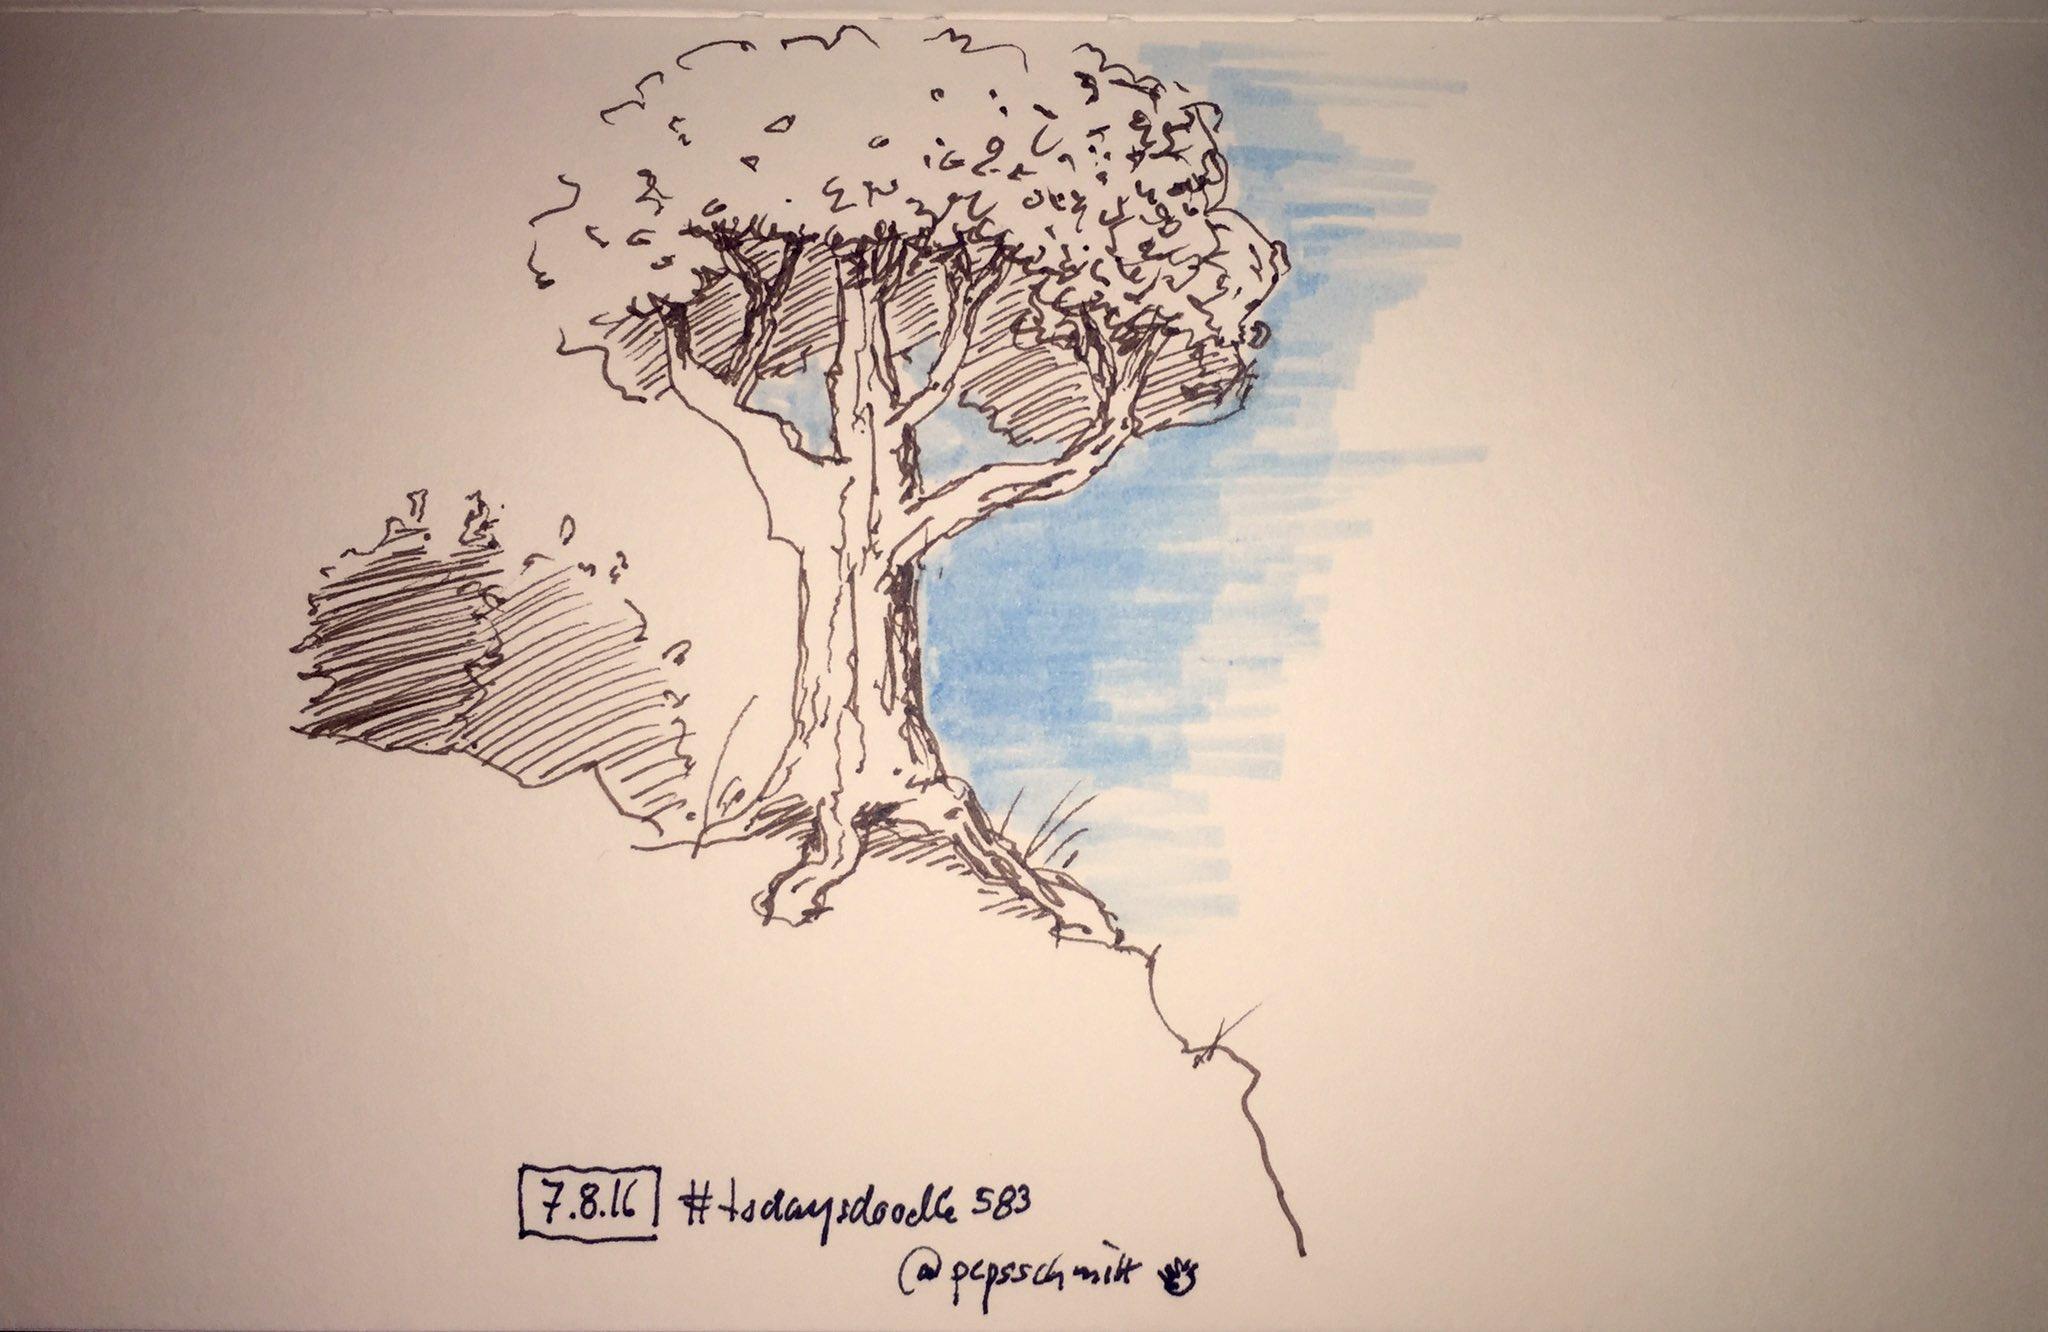 #todaysdoodle 583 #handdrawn #tree https://t.co/6ttFzHvHk3